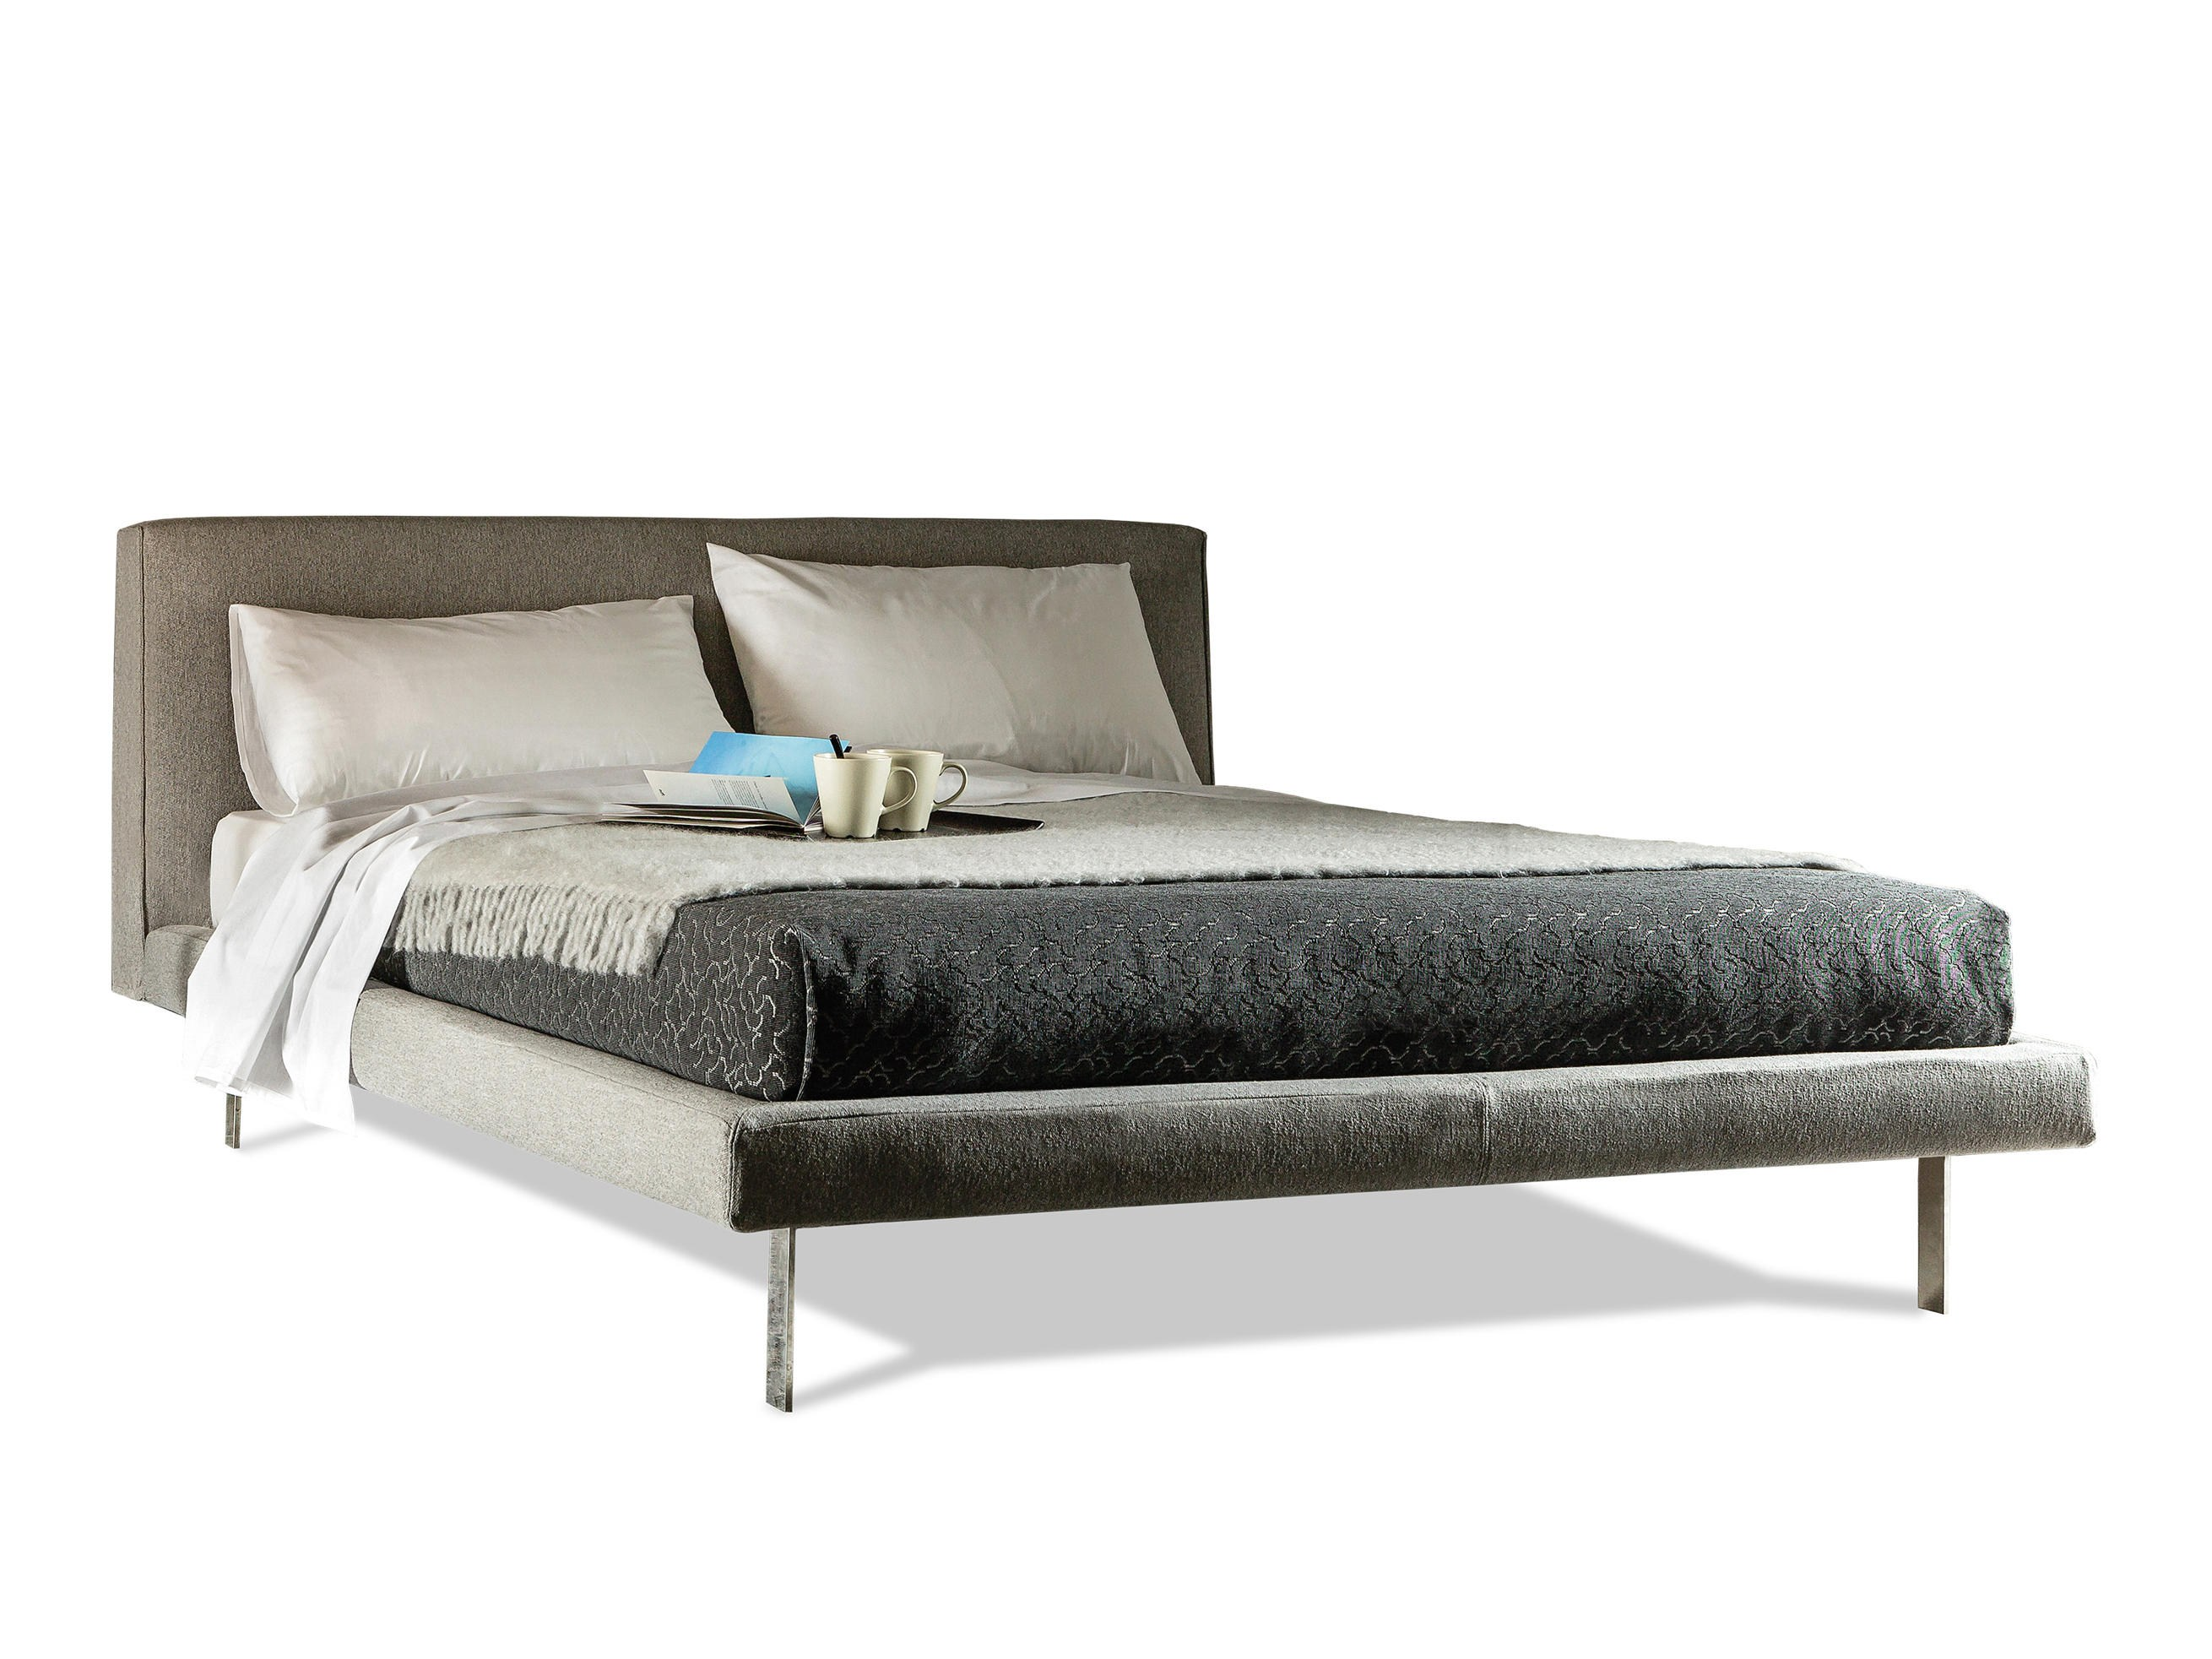 Ikea Kojenbett Weiss : kojenbett 120x200 excellent kojenbett 120x200 with kojenbett 120x200 cheap bett weiss with ~ Sanjose-hotels-ca.com Haus und Dekorationen